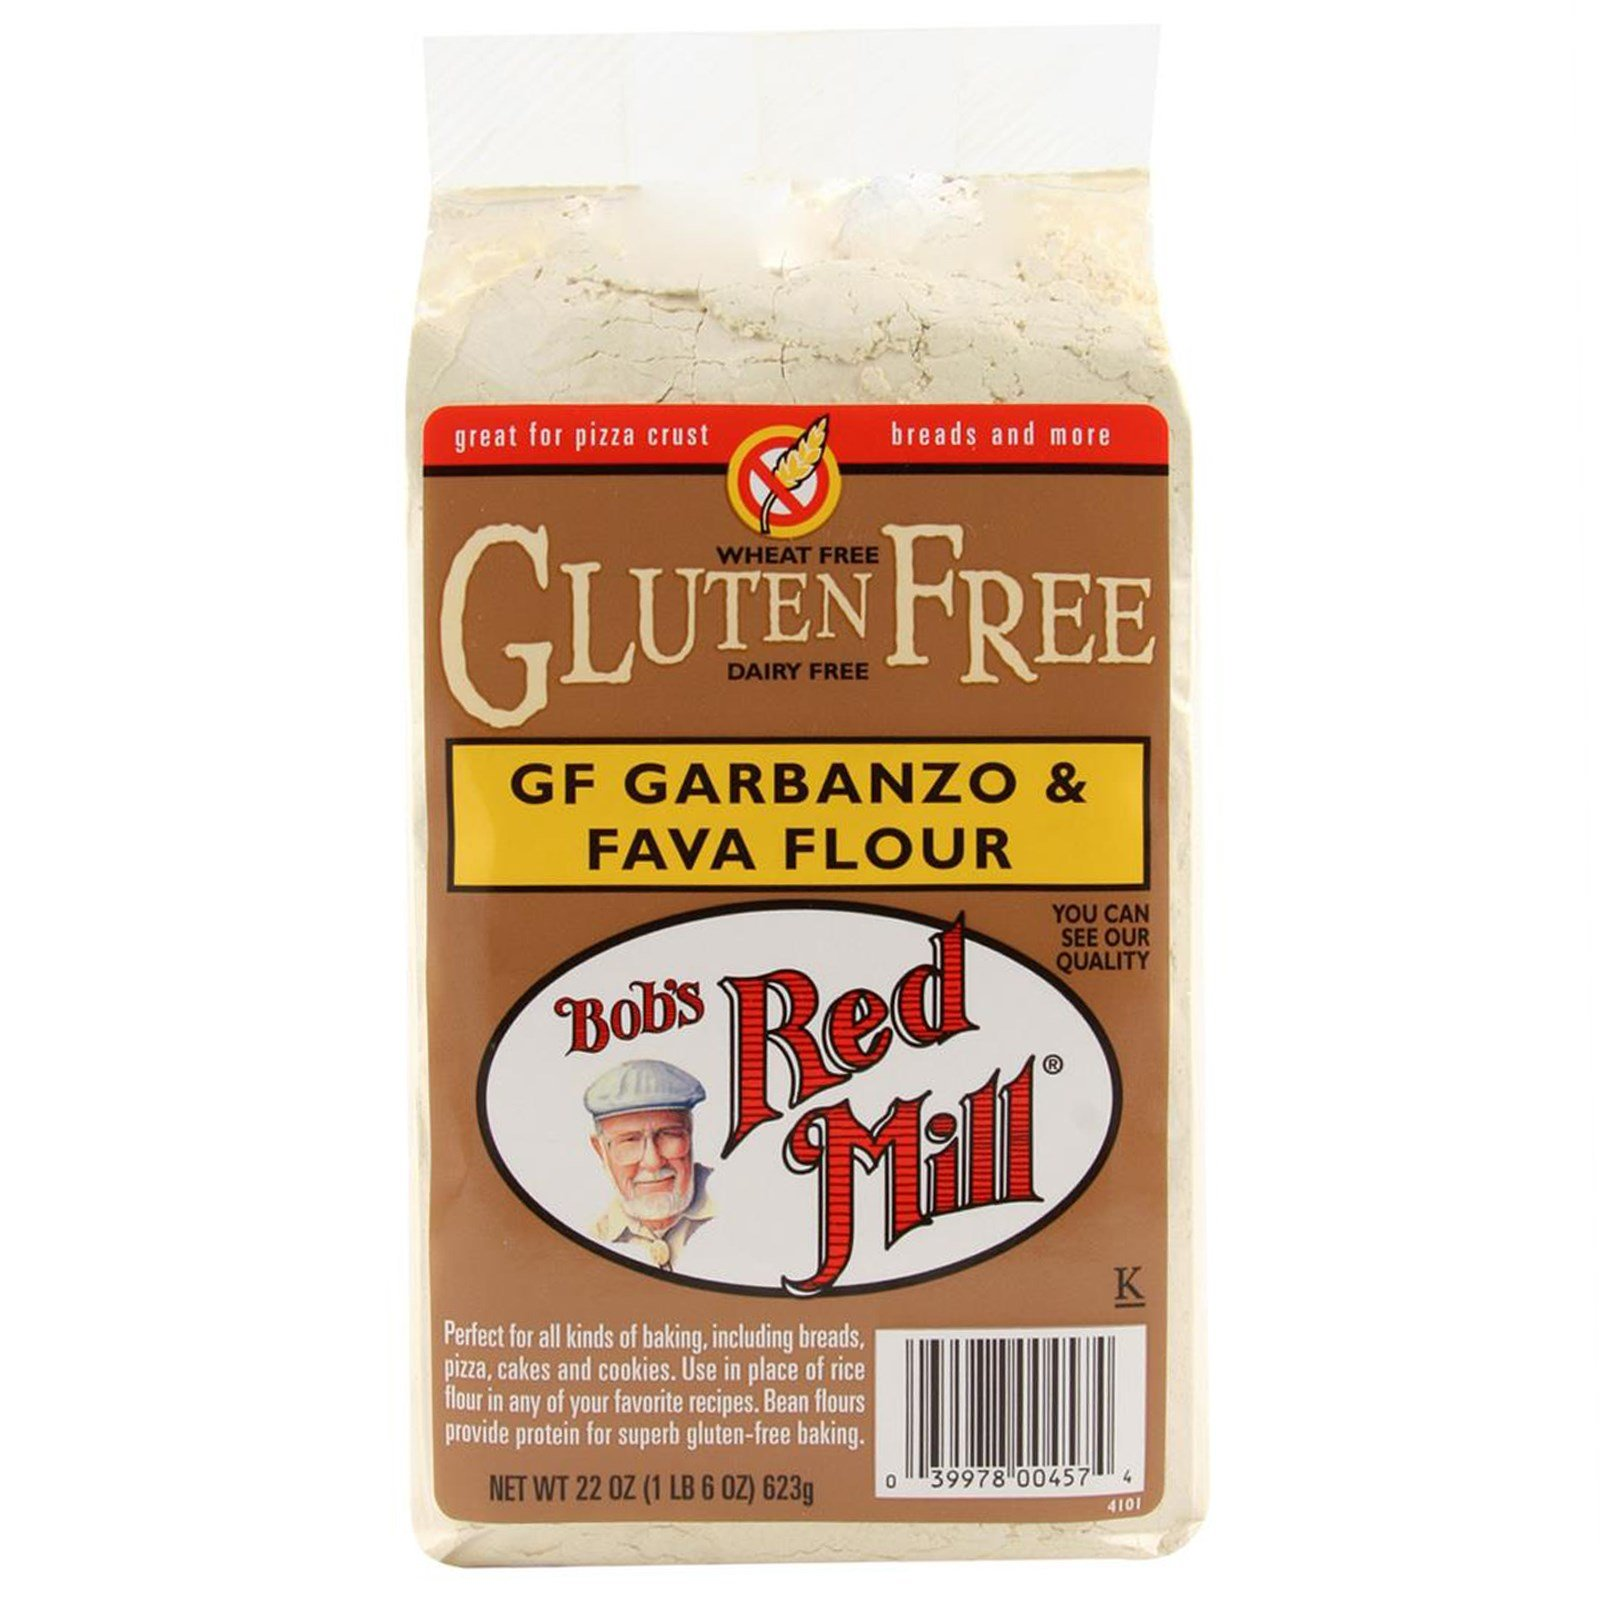 Bob's Red Mill, Garbanzo & Fava Flour, Gluten Free, 22 oz(Pack of 3)